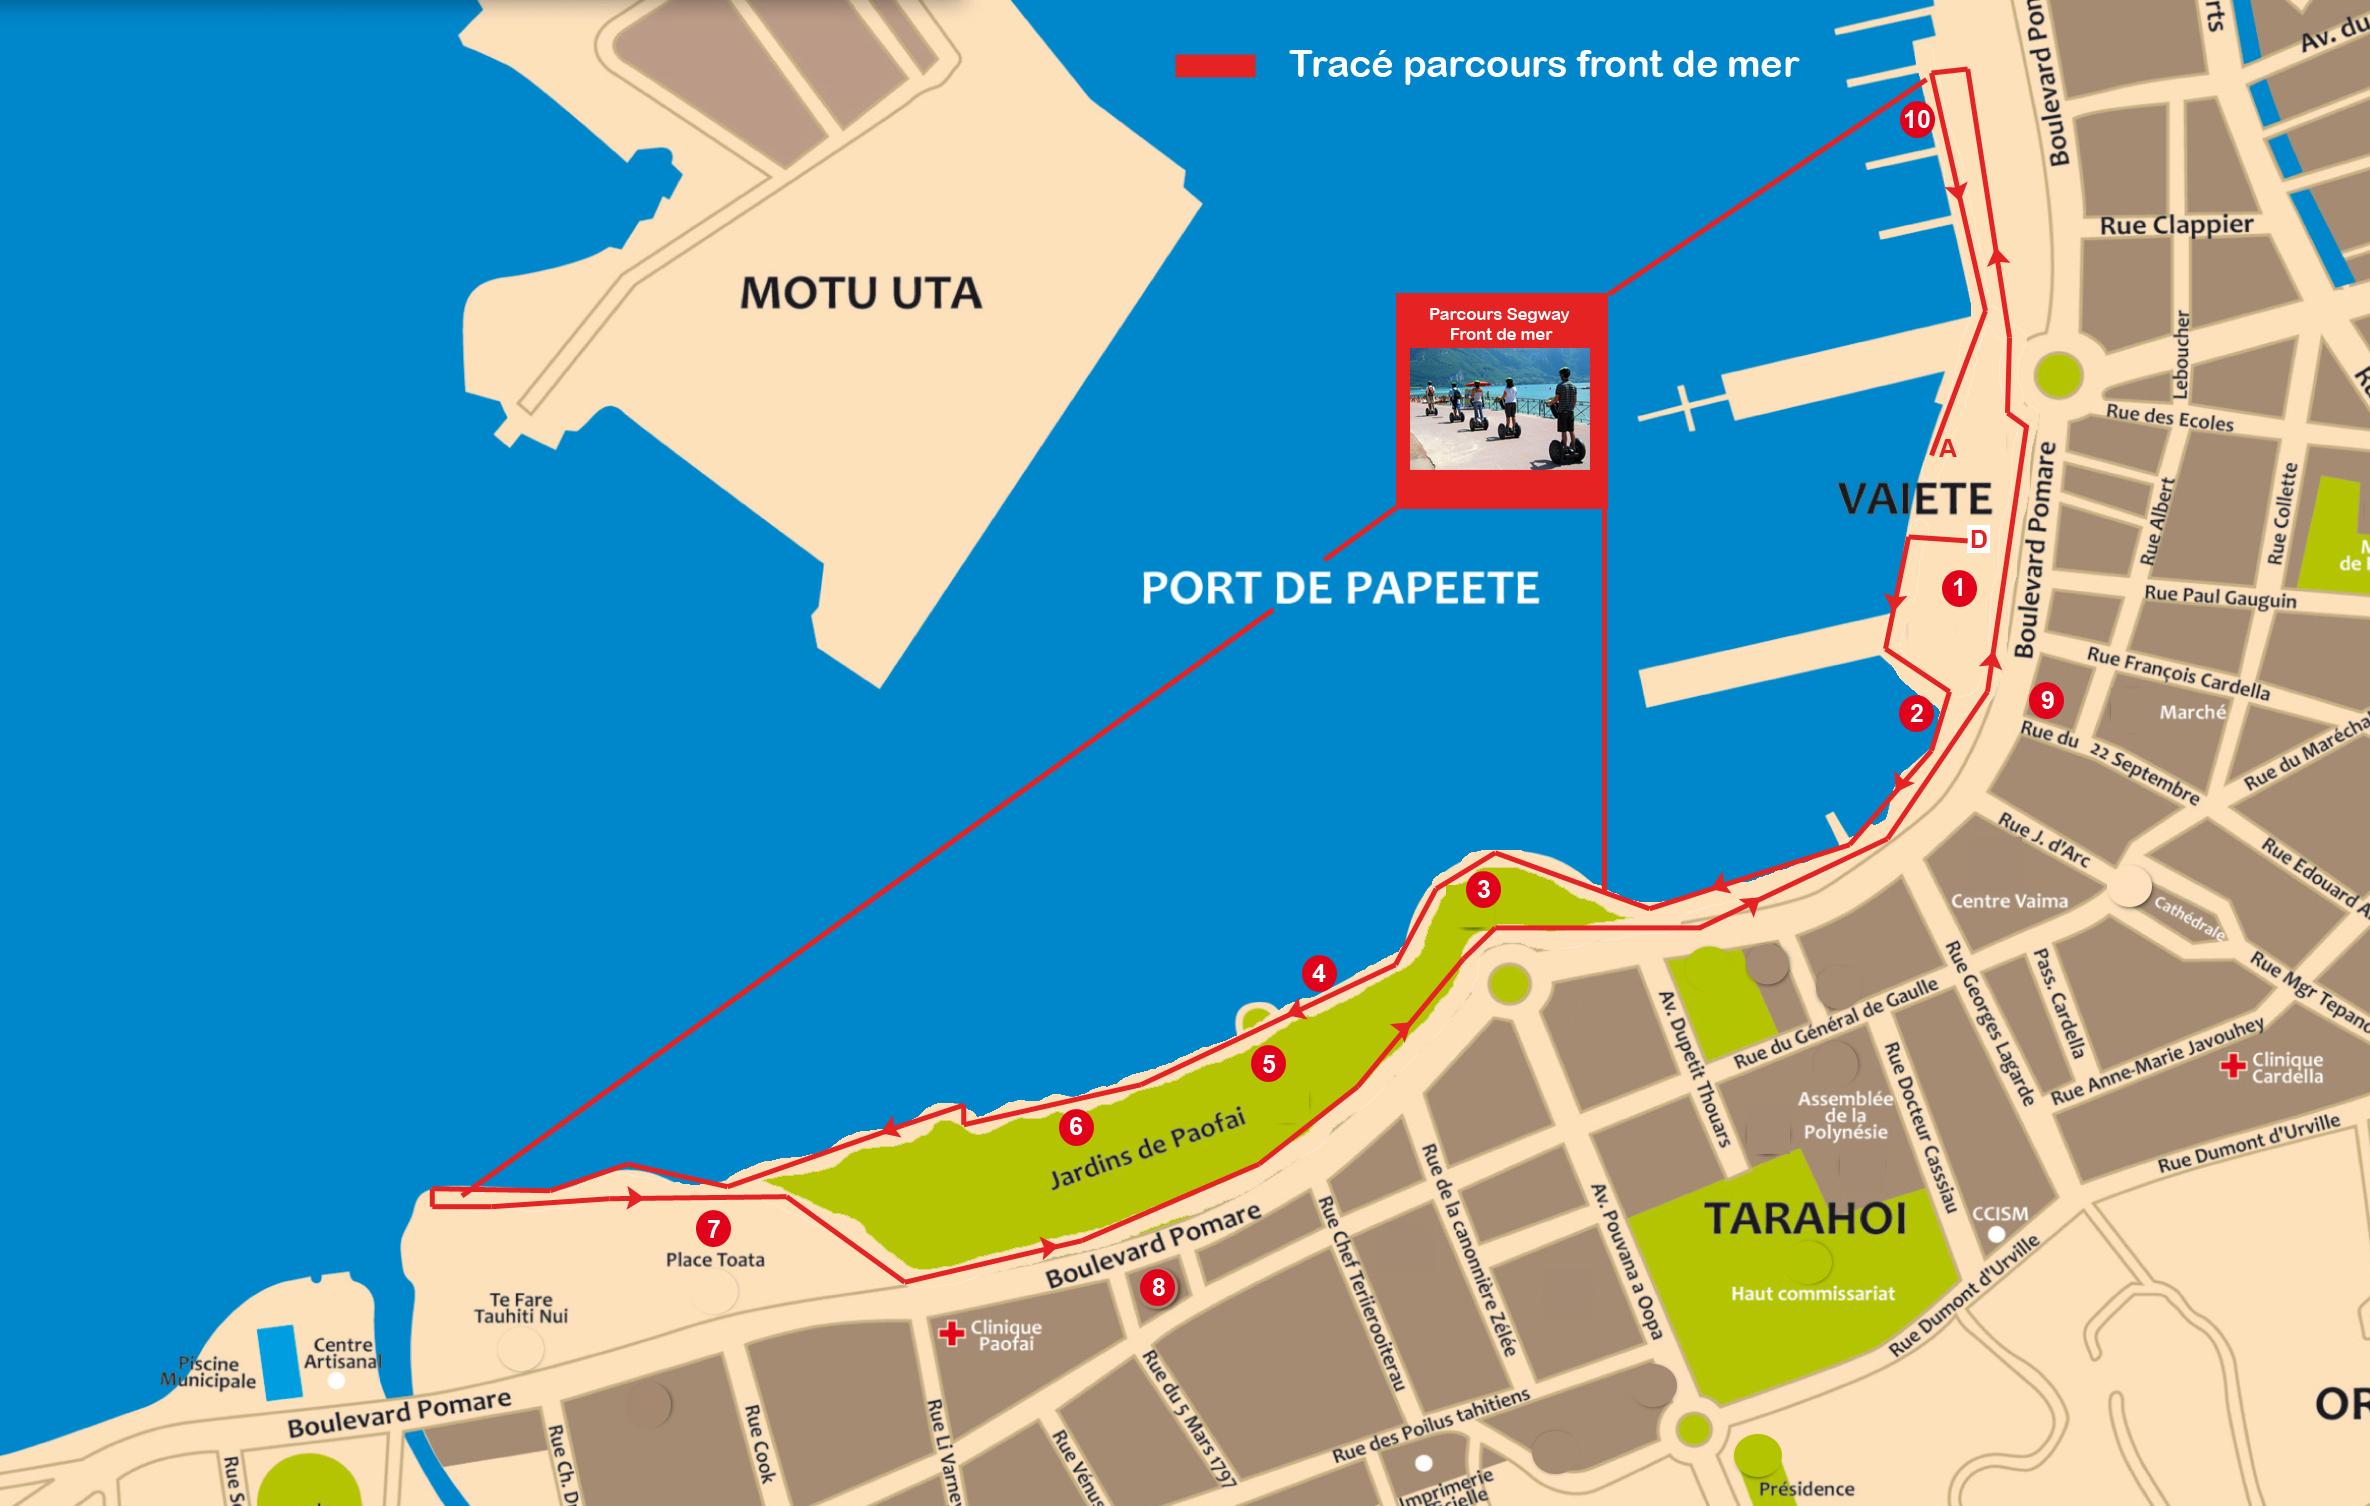 Plan balade front de mer Papeete en Segway